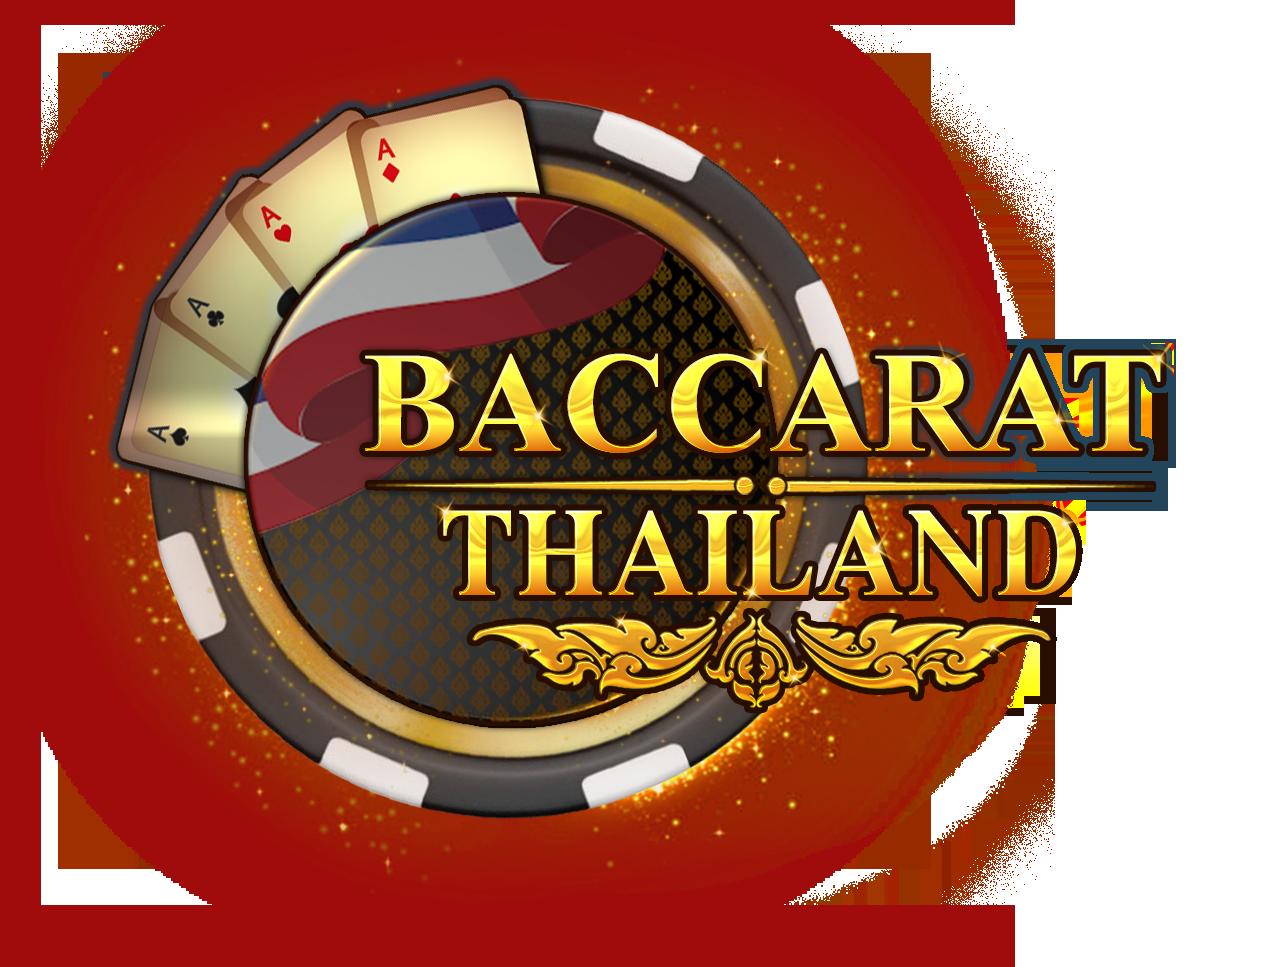 BaccaratThailand